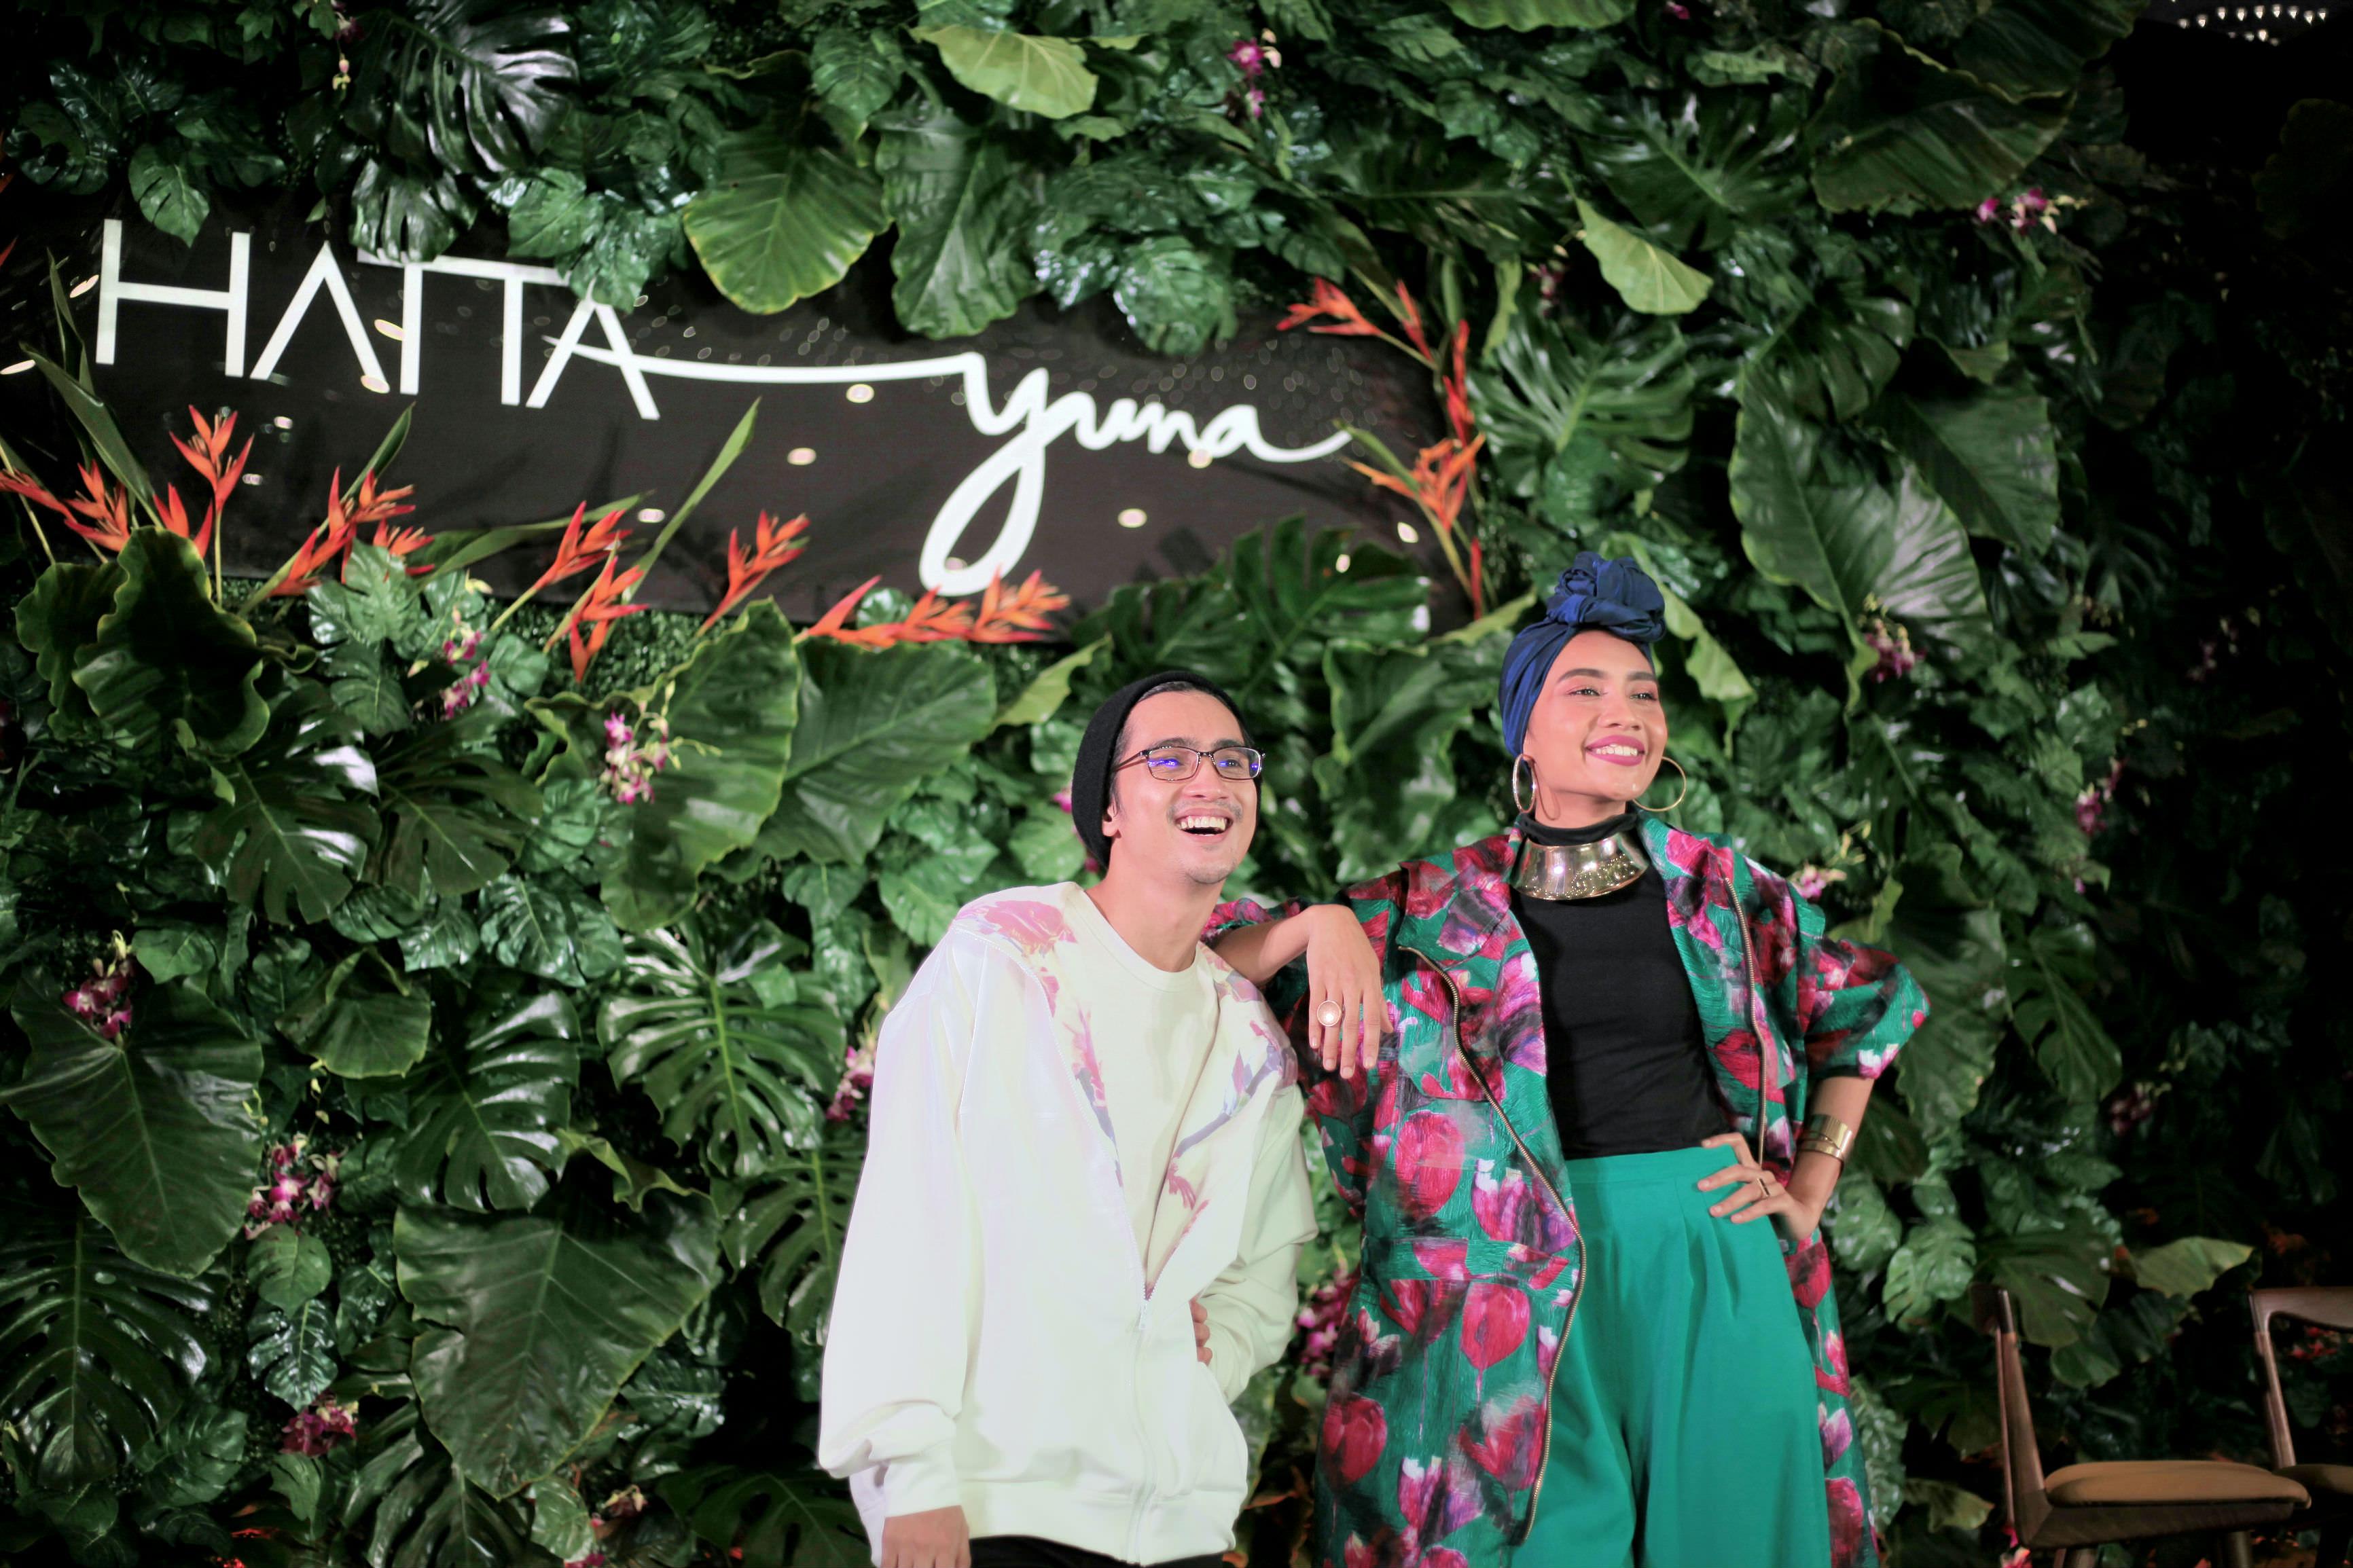 HATTA x Yuna